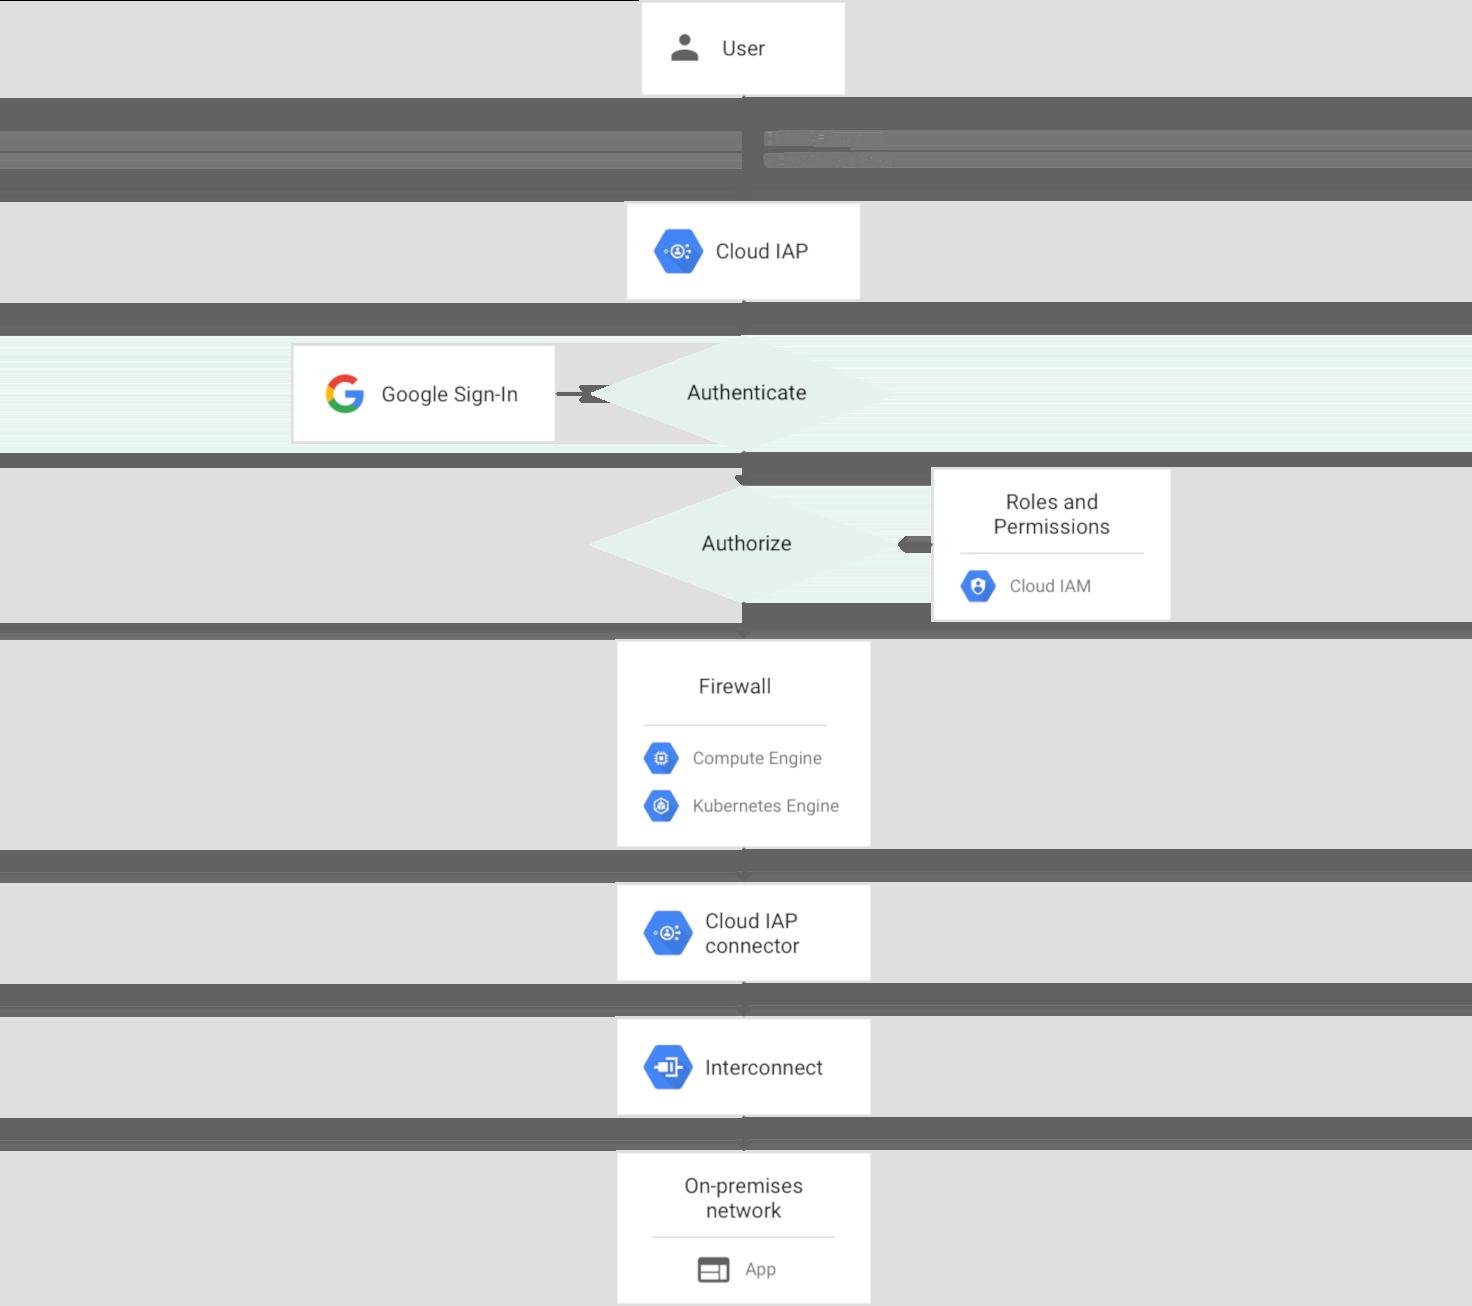 Cloud IAP 使用時のオンプレミス アプリへのリクエストパスの図